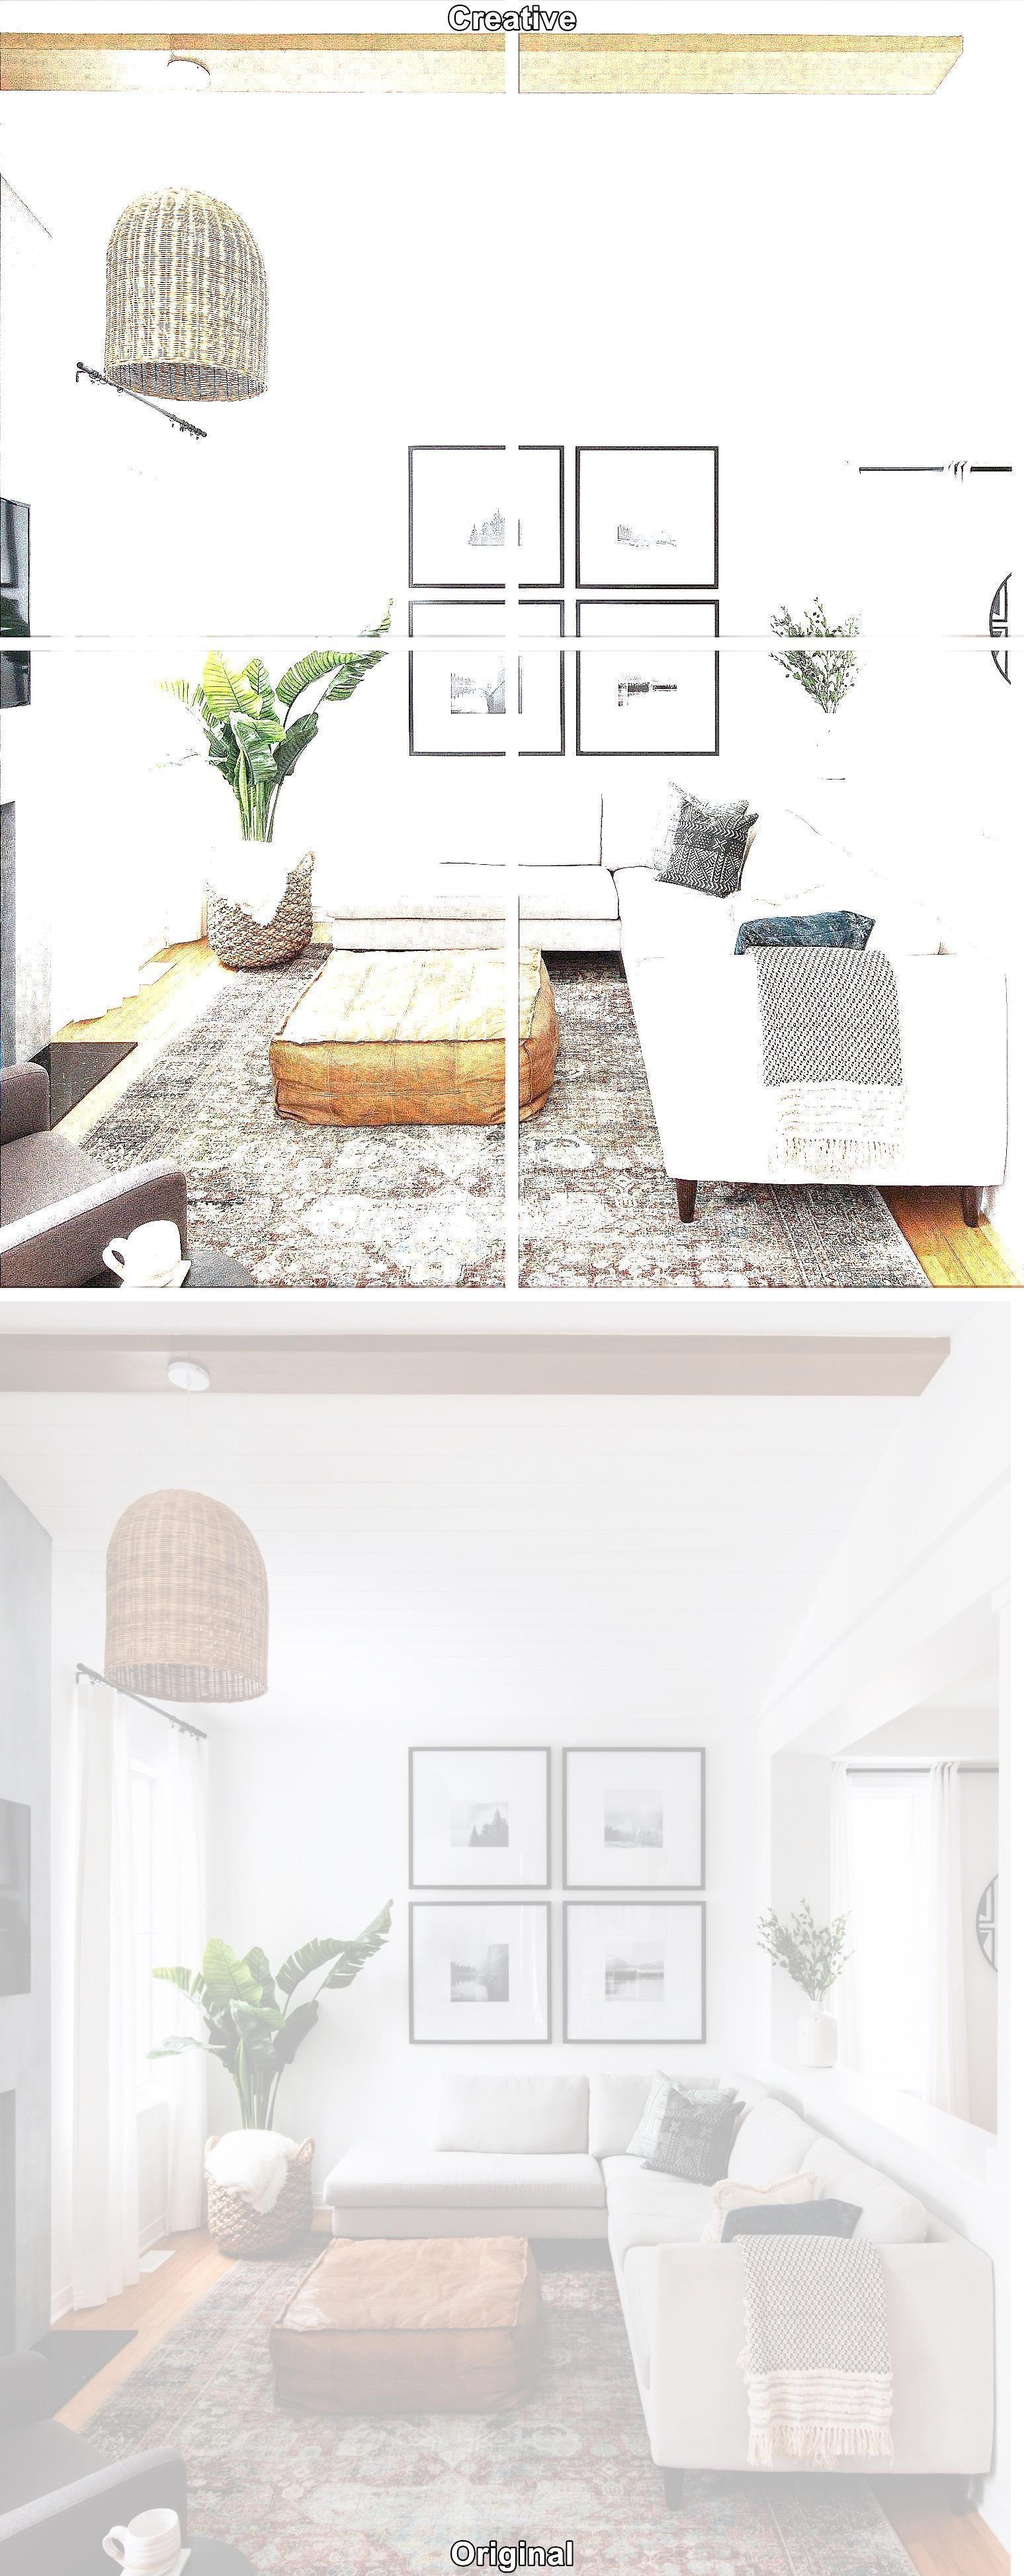 Small Living Room Arrangement Home Interior Design App Rooms Inspiration Small Living Room Arrangements Living Room Arrangements House Interior